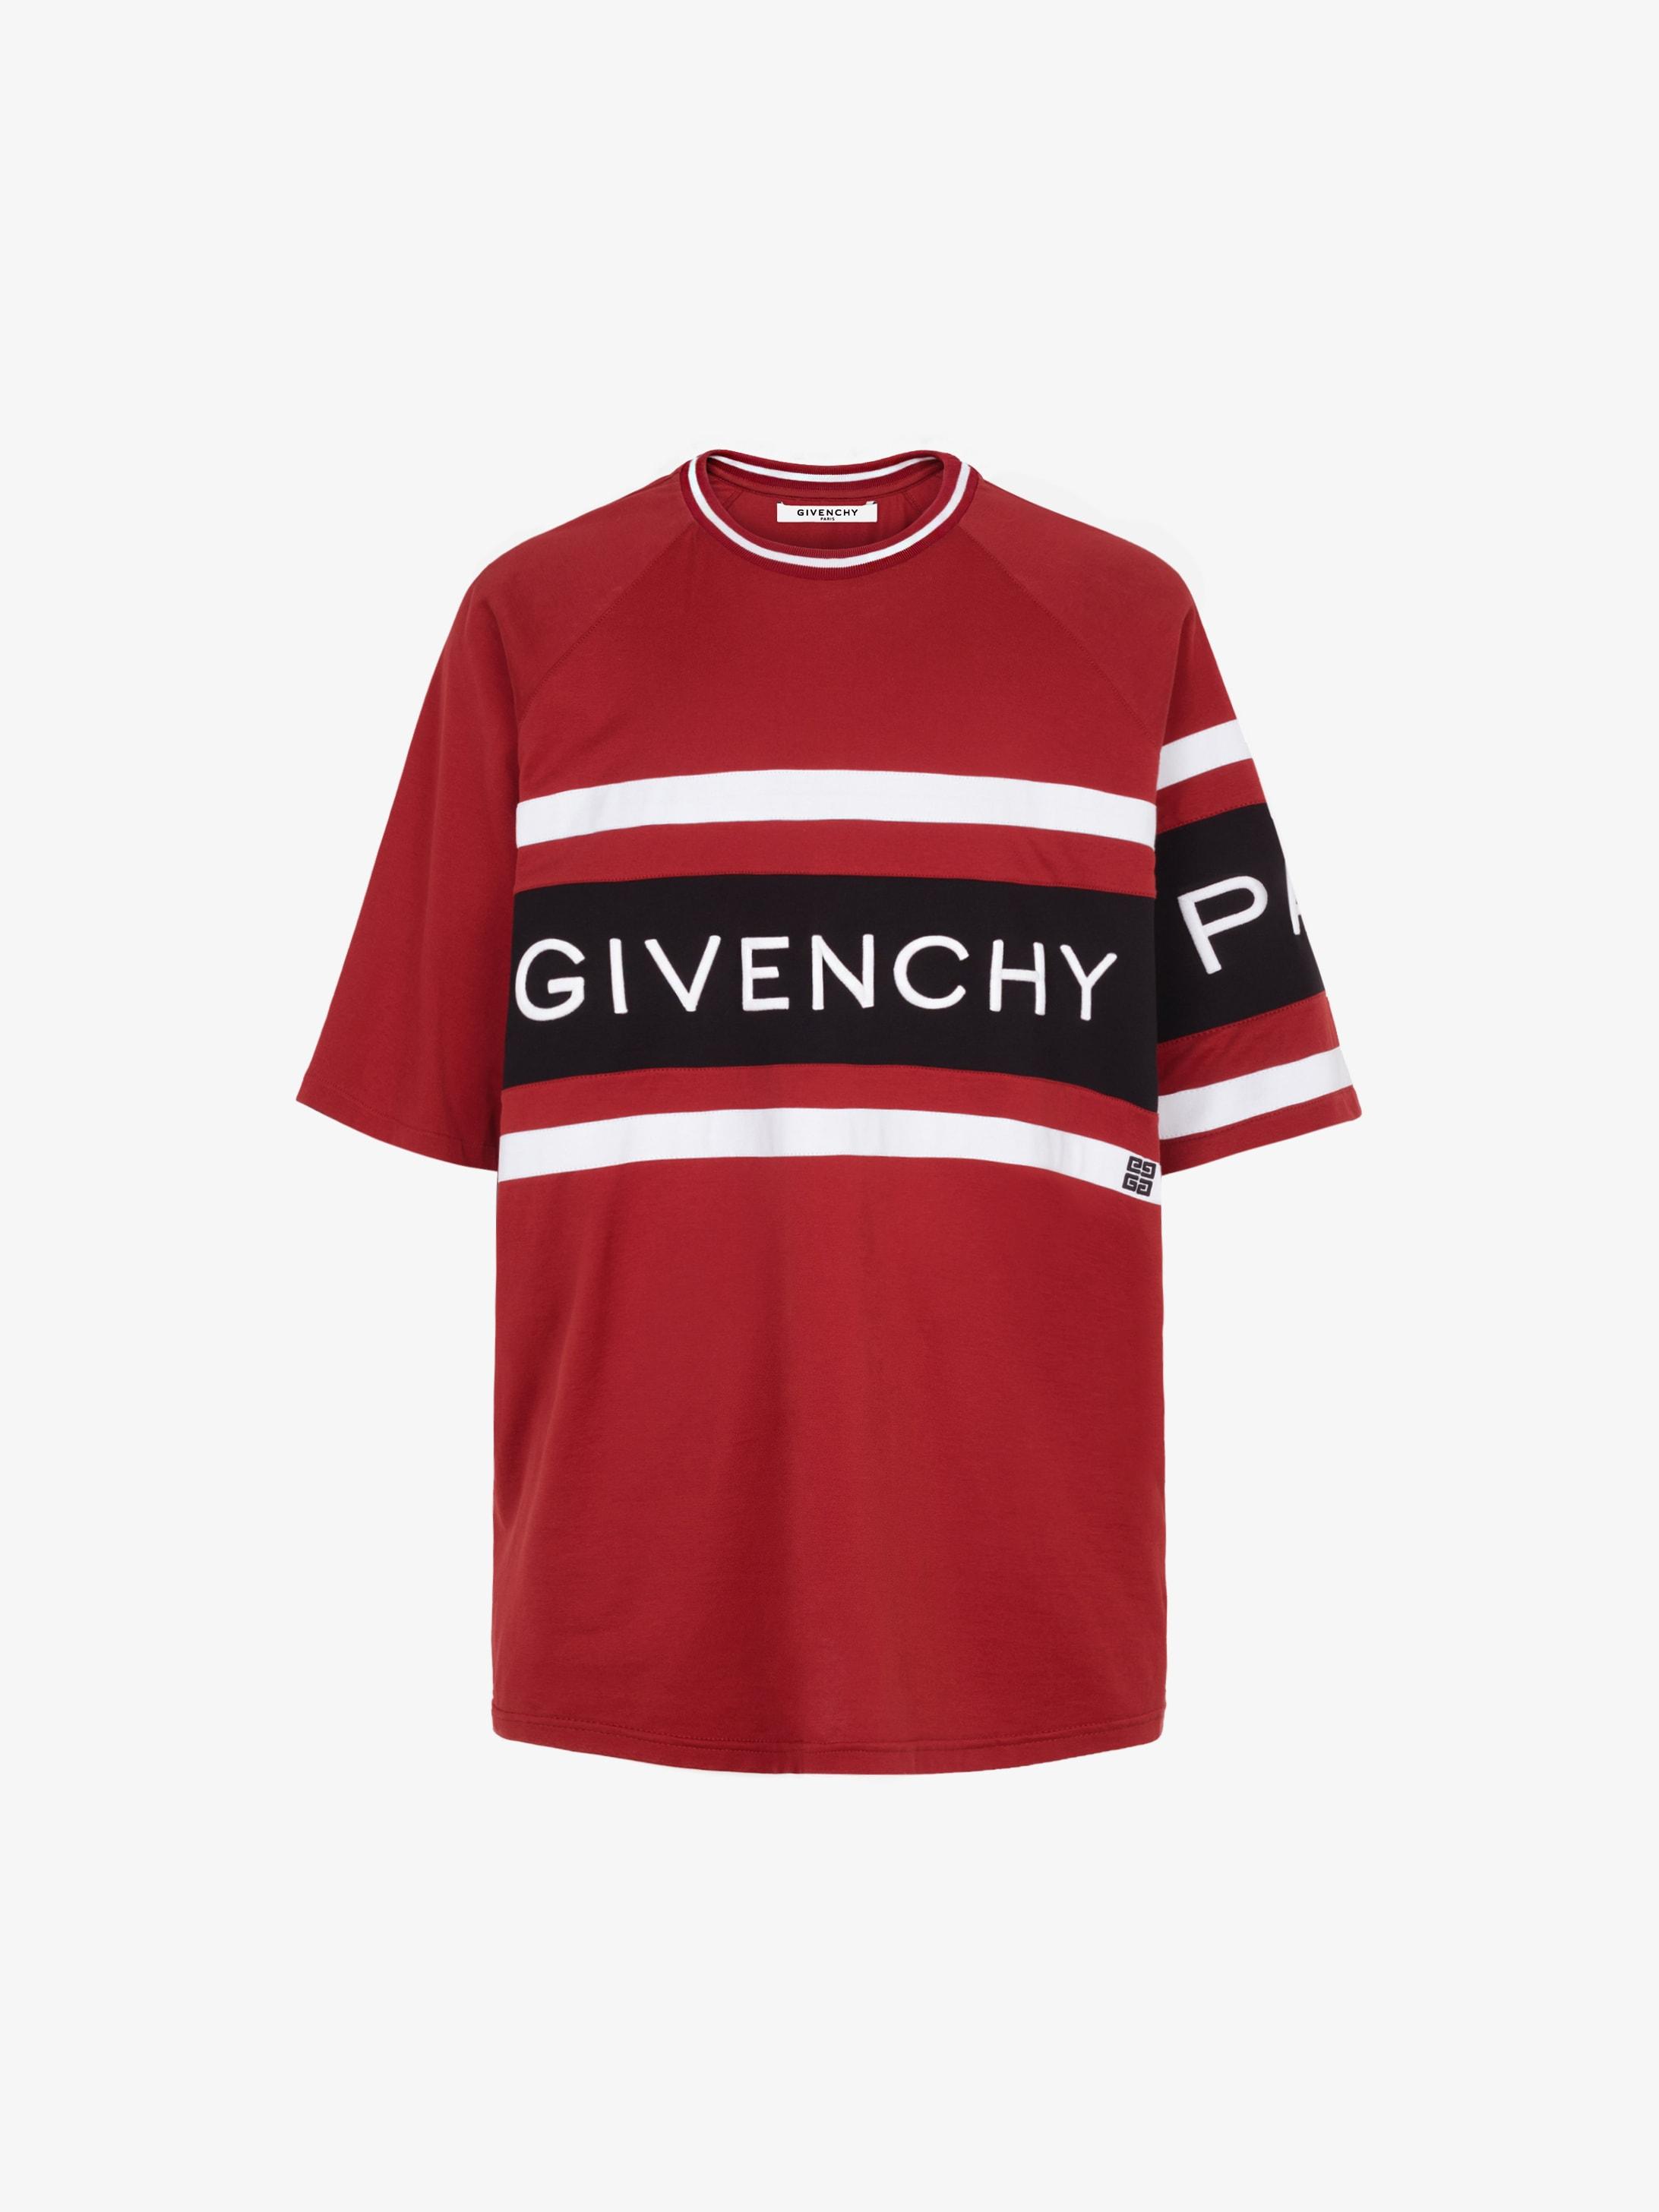 282b62ad GIVENCHY 4G contrasting slim T-shirt | GIVENCHY Paris